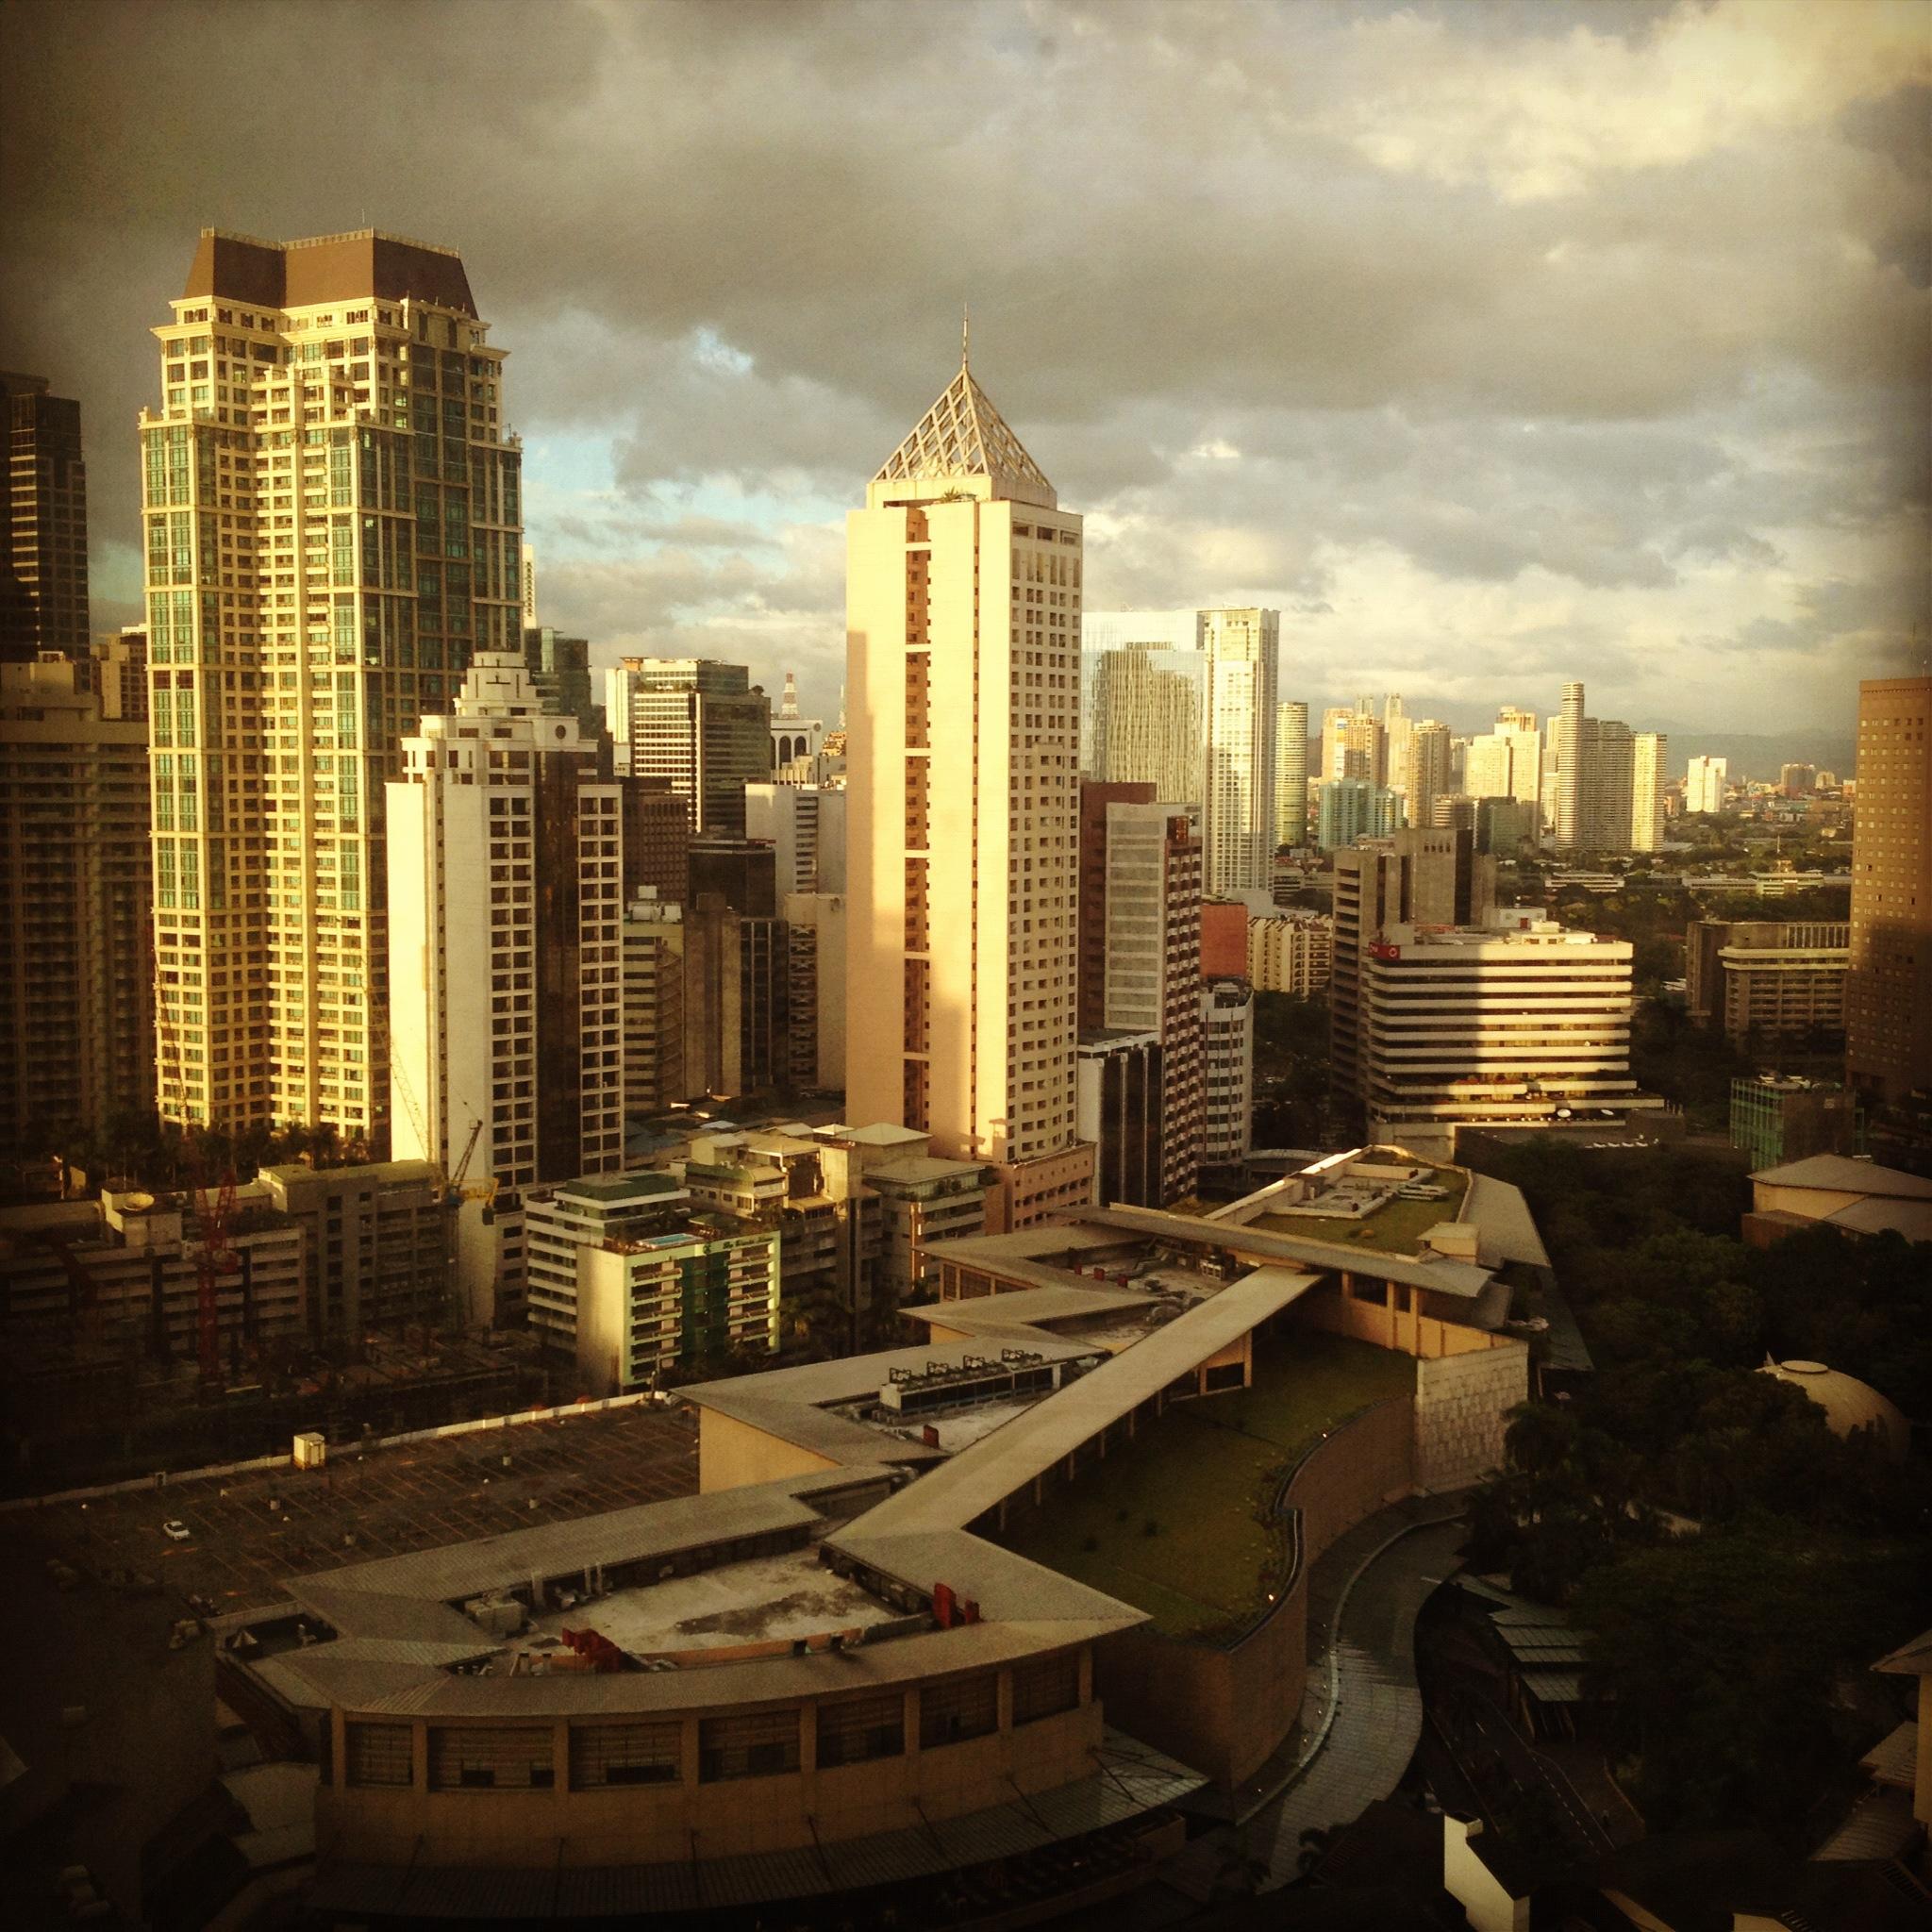 Filipiny_Manila_Makati, IMG_0398